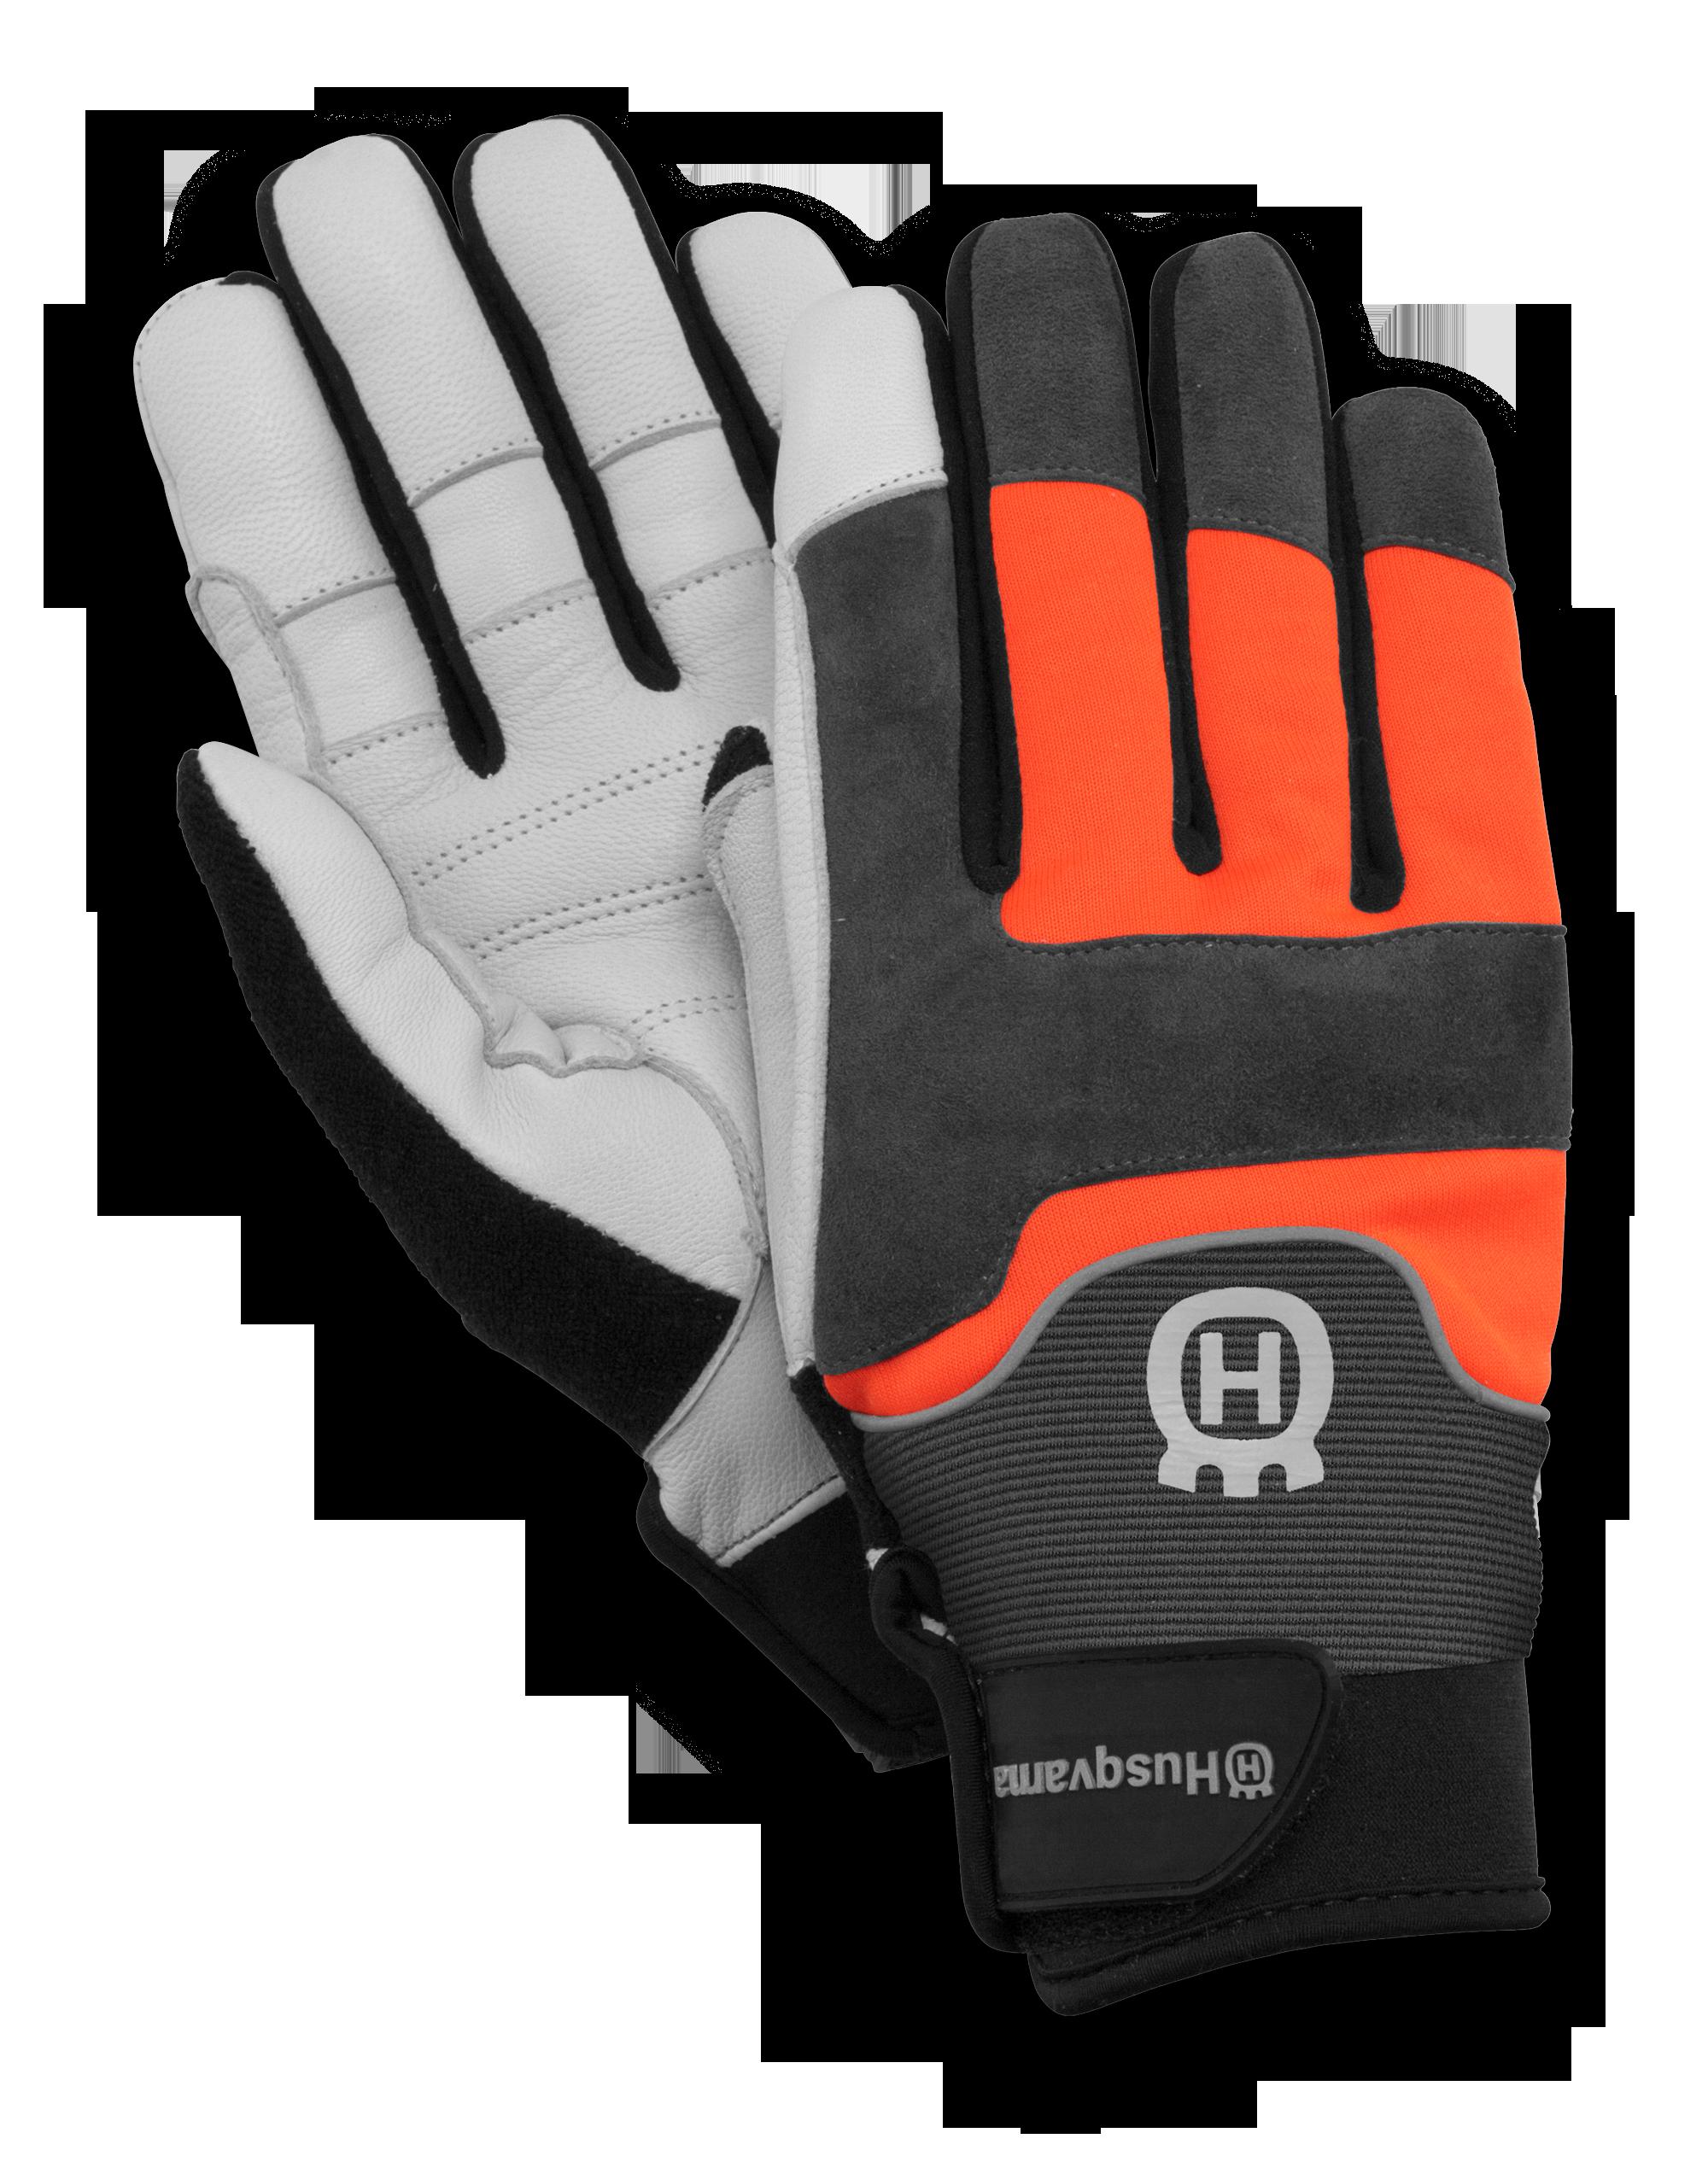 Glove clipart cloth. Husqvarna gloves technical work